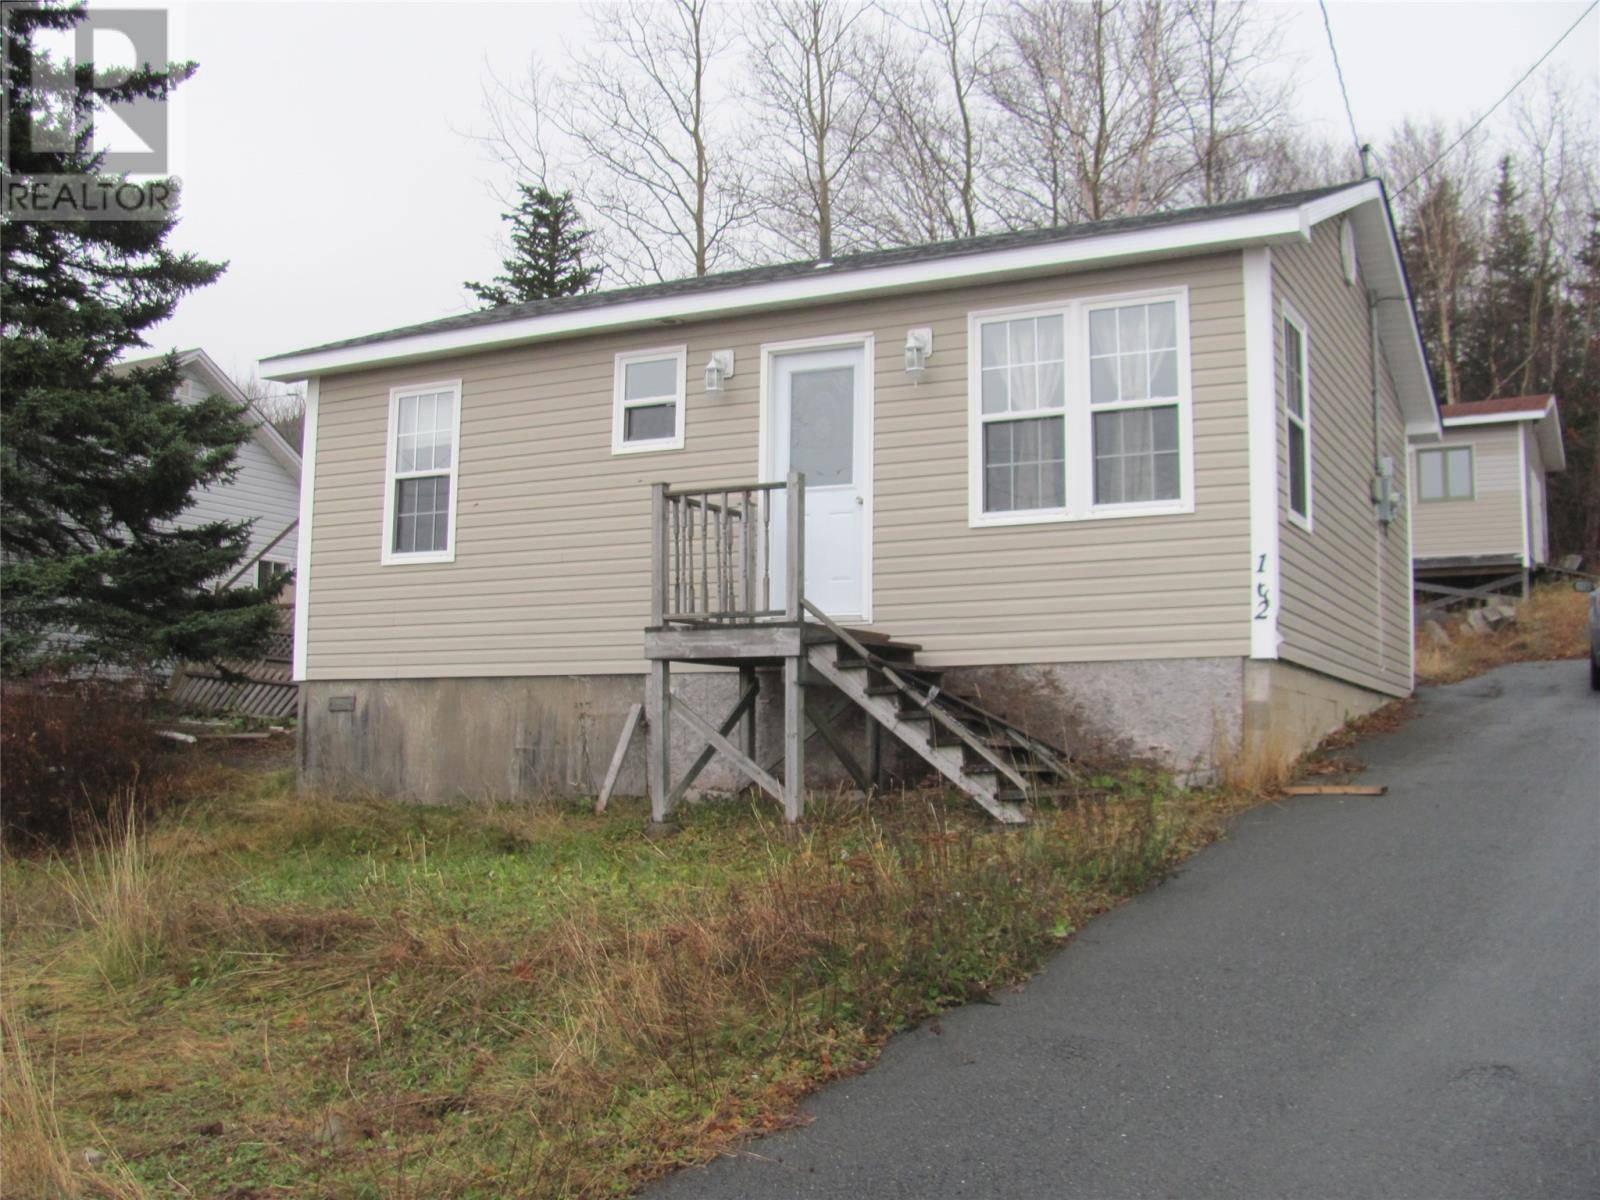 House for sale at 162 Memorial Dr Clarenville Newfoundland - MLS: 1209948